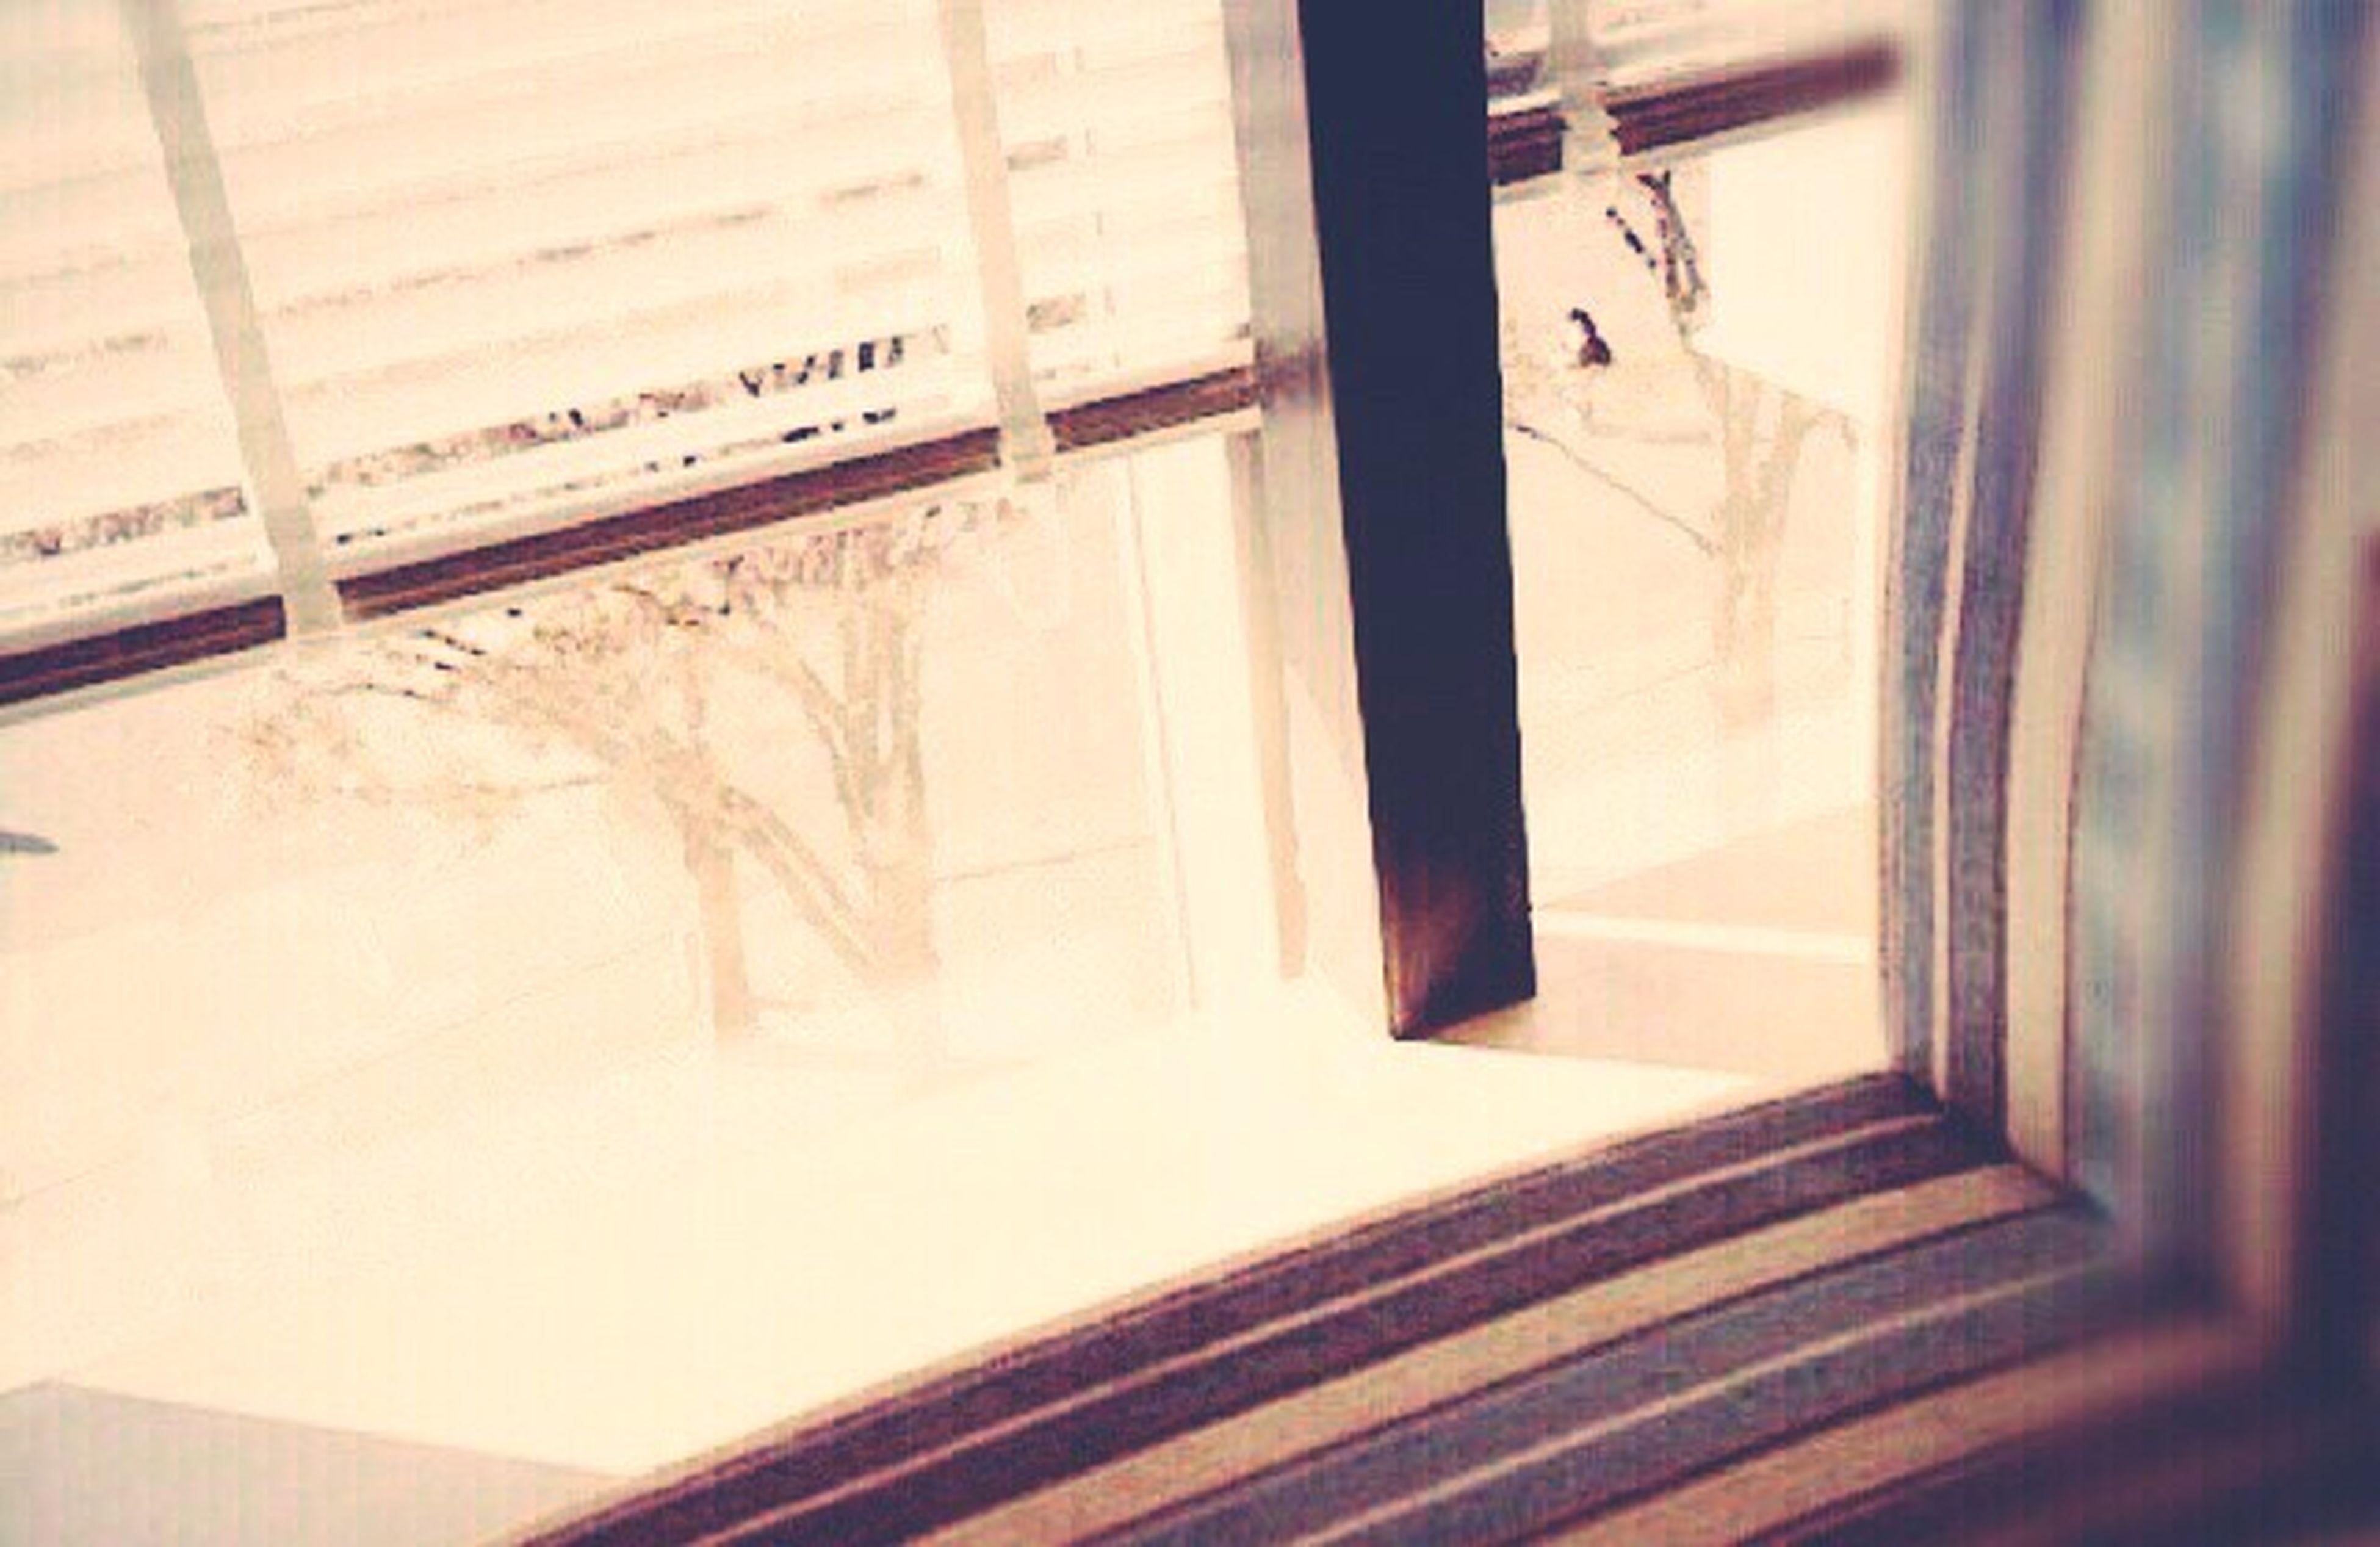 indoors, window, transparent, glass - material, transportation, public transportation, vehicle interior, rail transportation, mode of transport, train - vehicle, railroad station, communication, technology, absence, no people, train, day, travel, reflection, passenger train